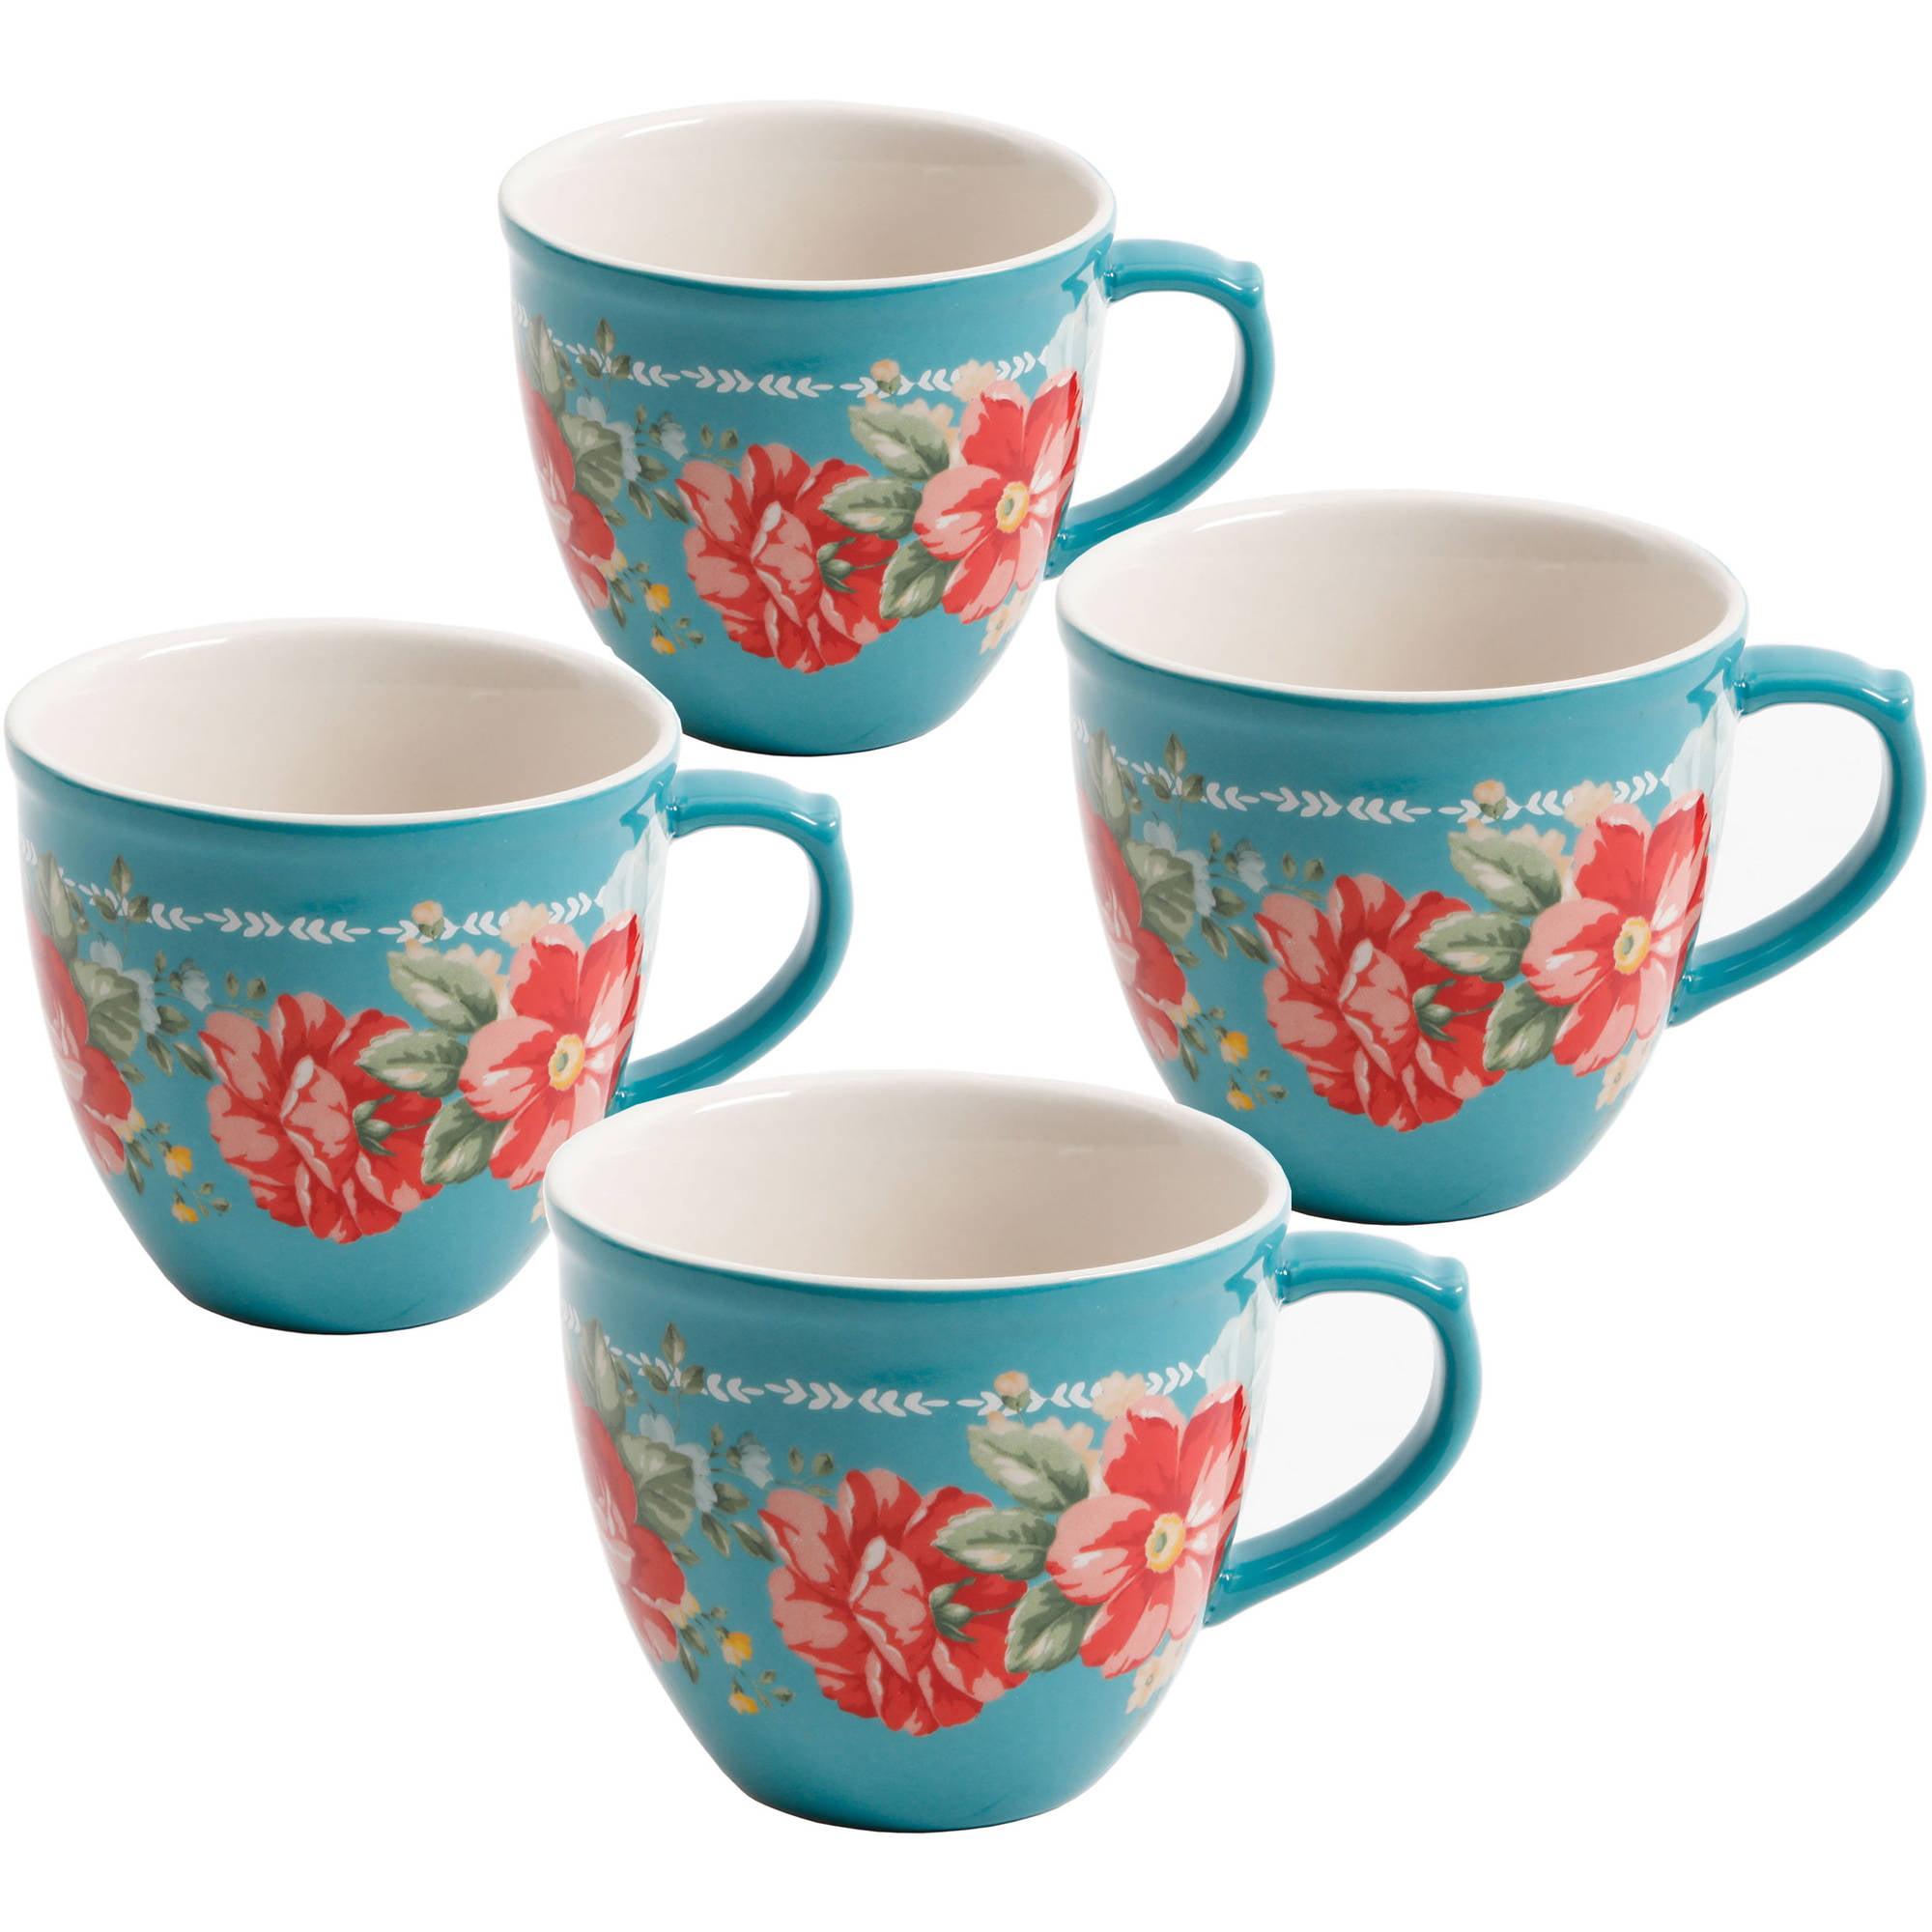 The Pioneer Woman Vintage Floral 4 Piece Mug Set 16 Fl Oz Walmart Com Walmart Com